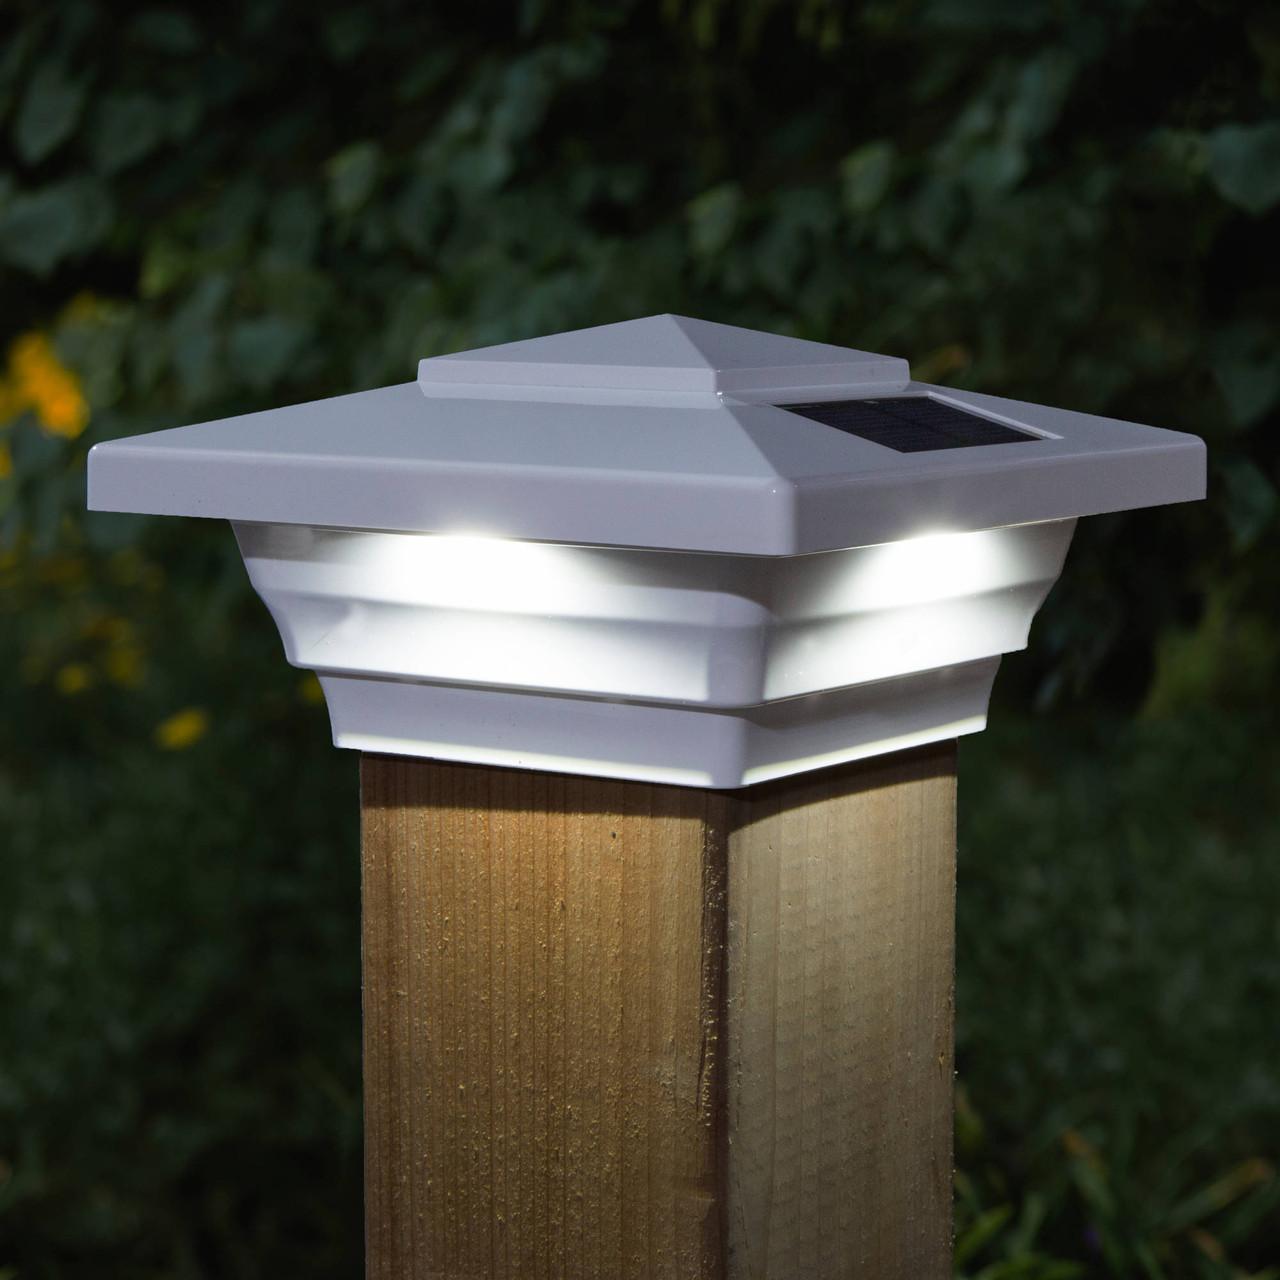 Windsor White Solar Post Cap Light on Wood Post At Night